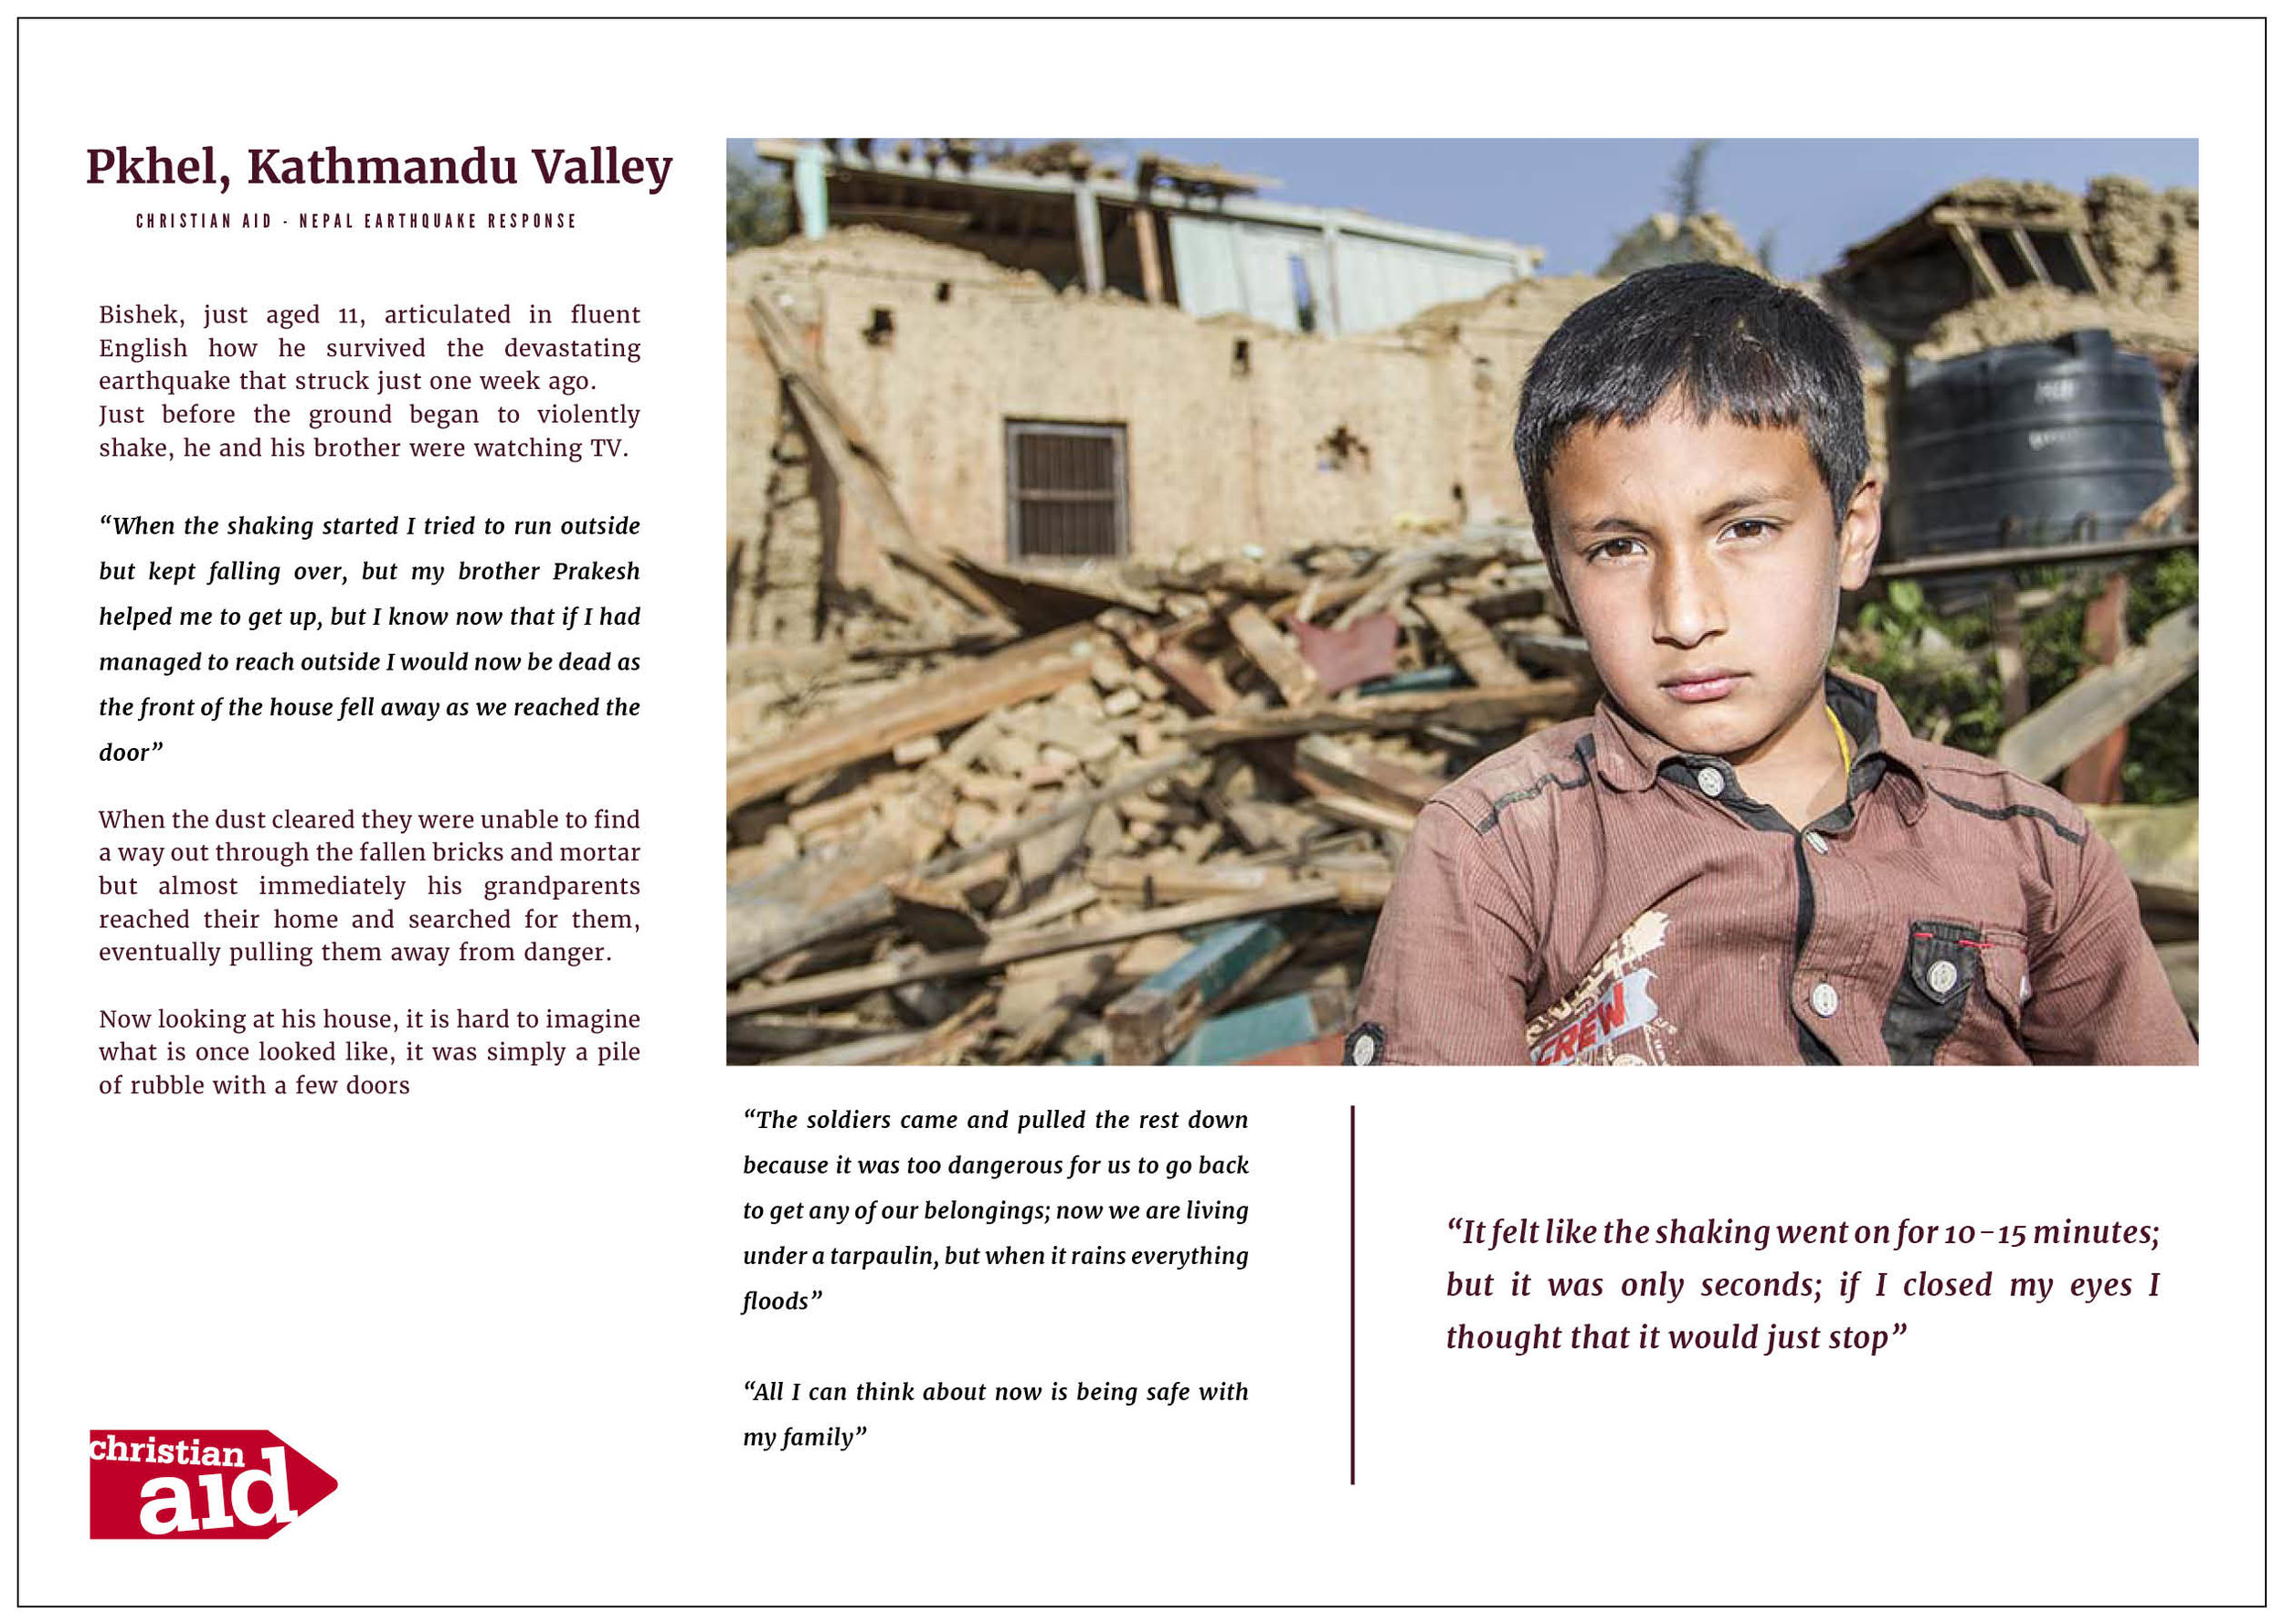 Christian Aid - Earthquake Response Programme